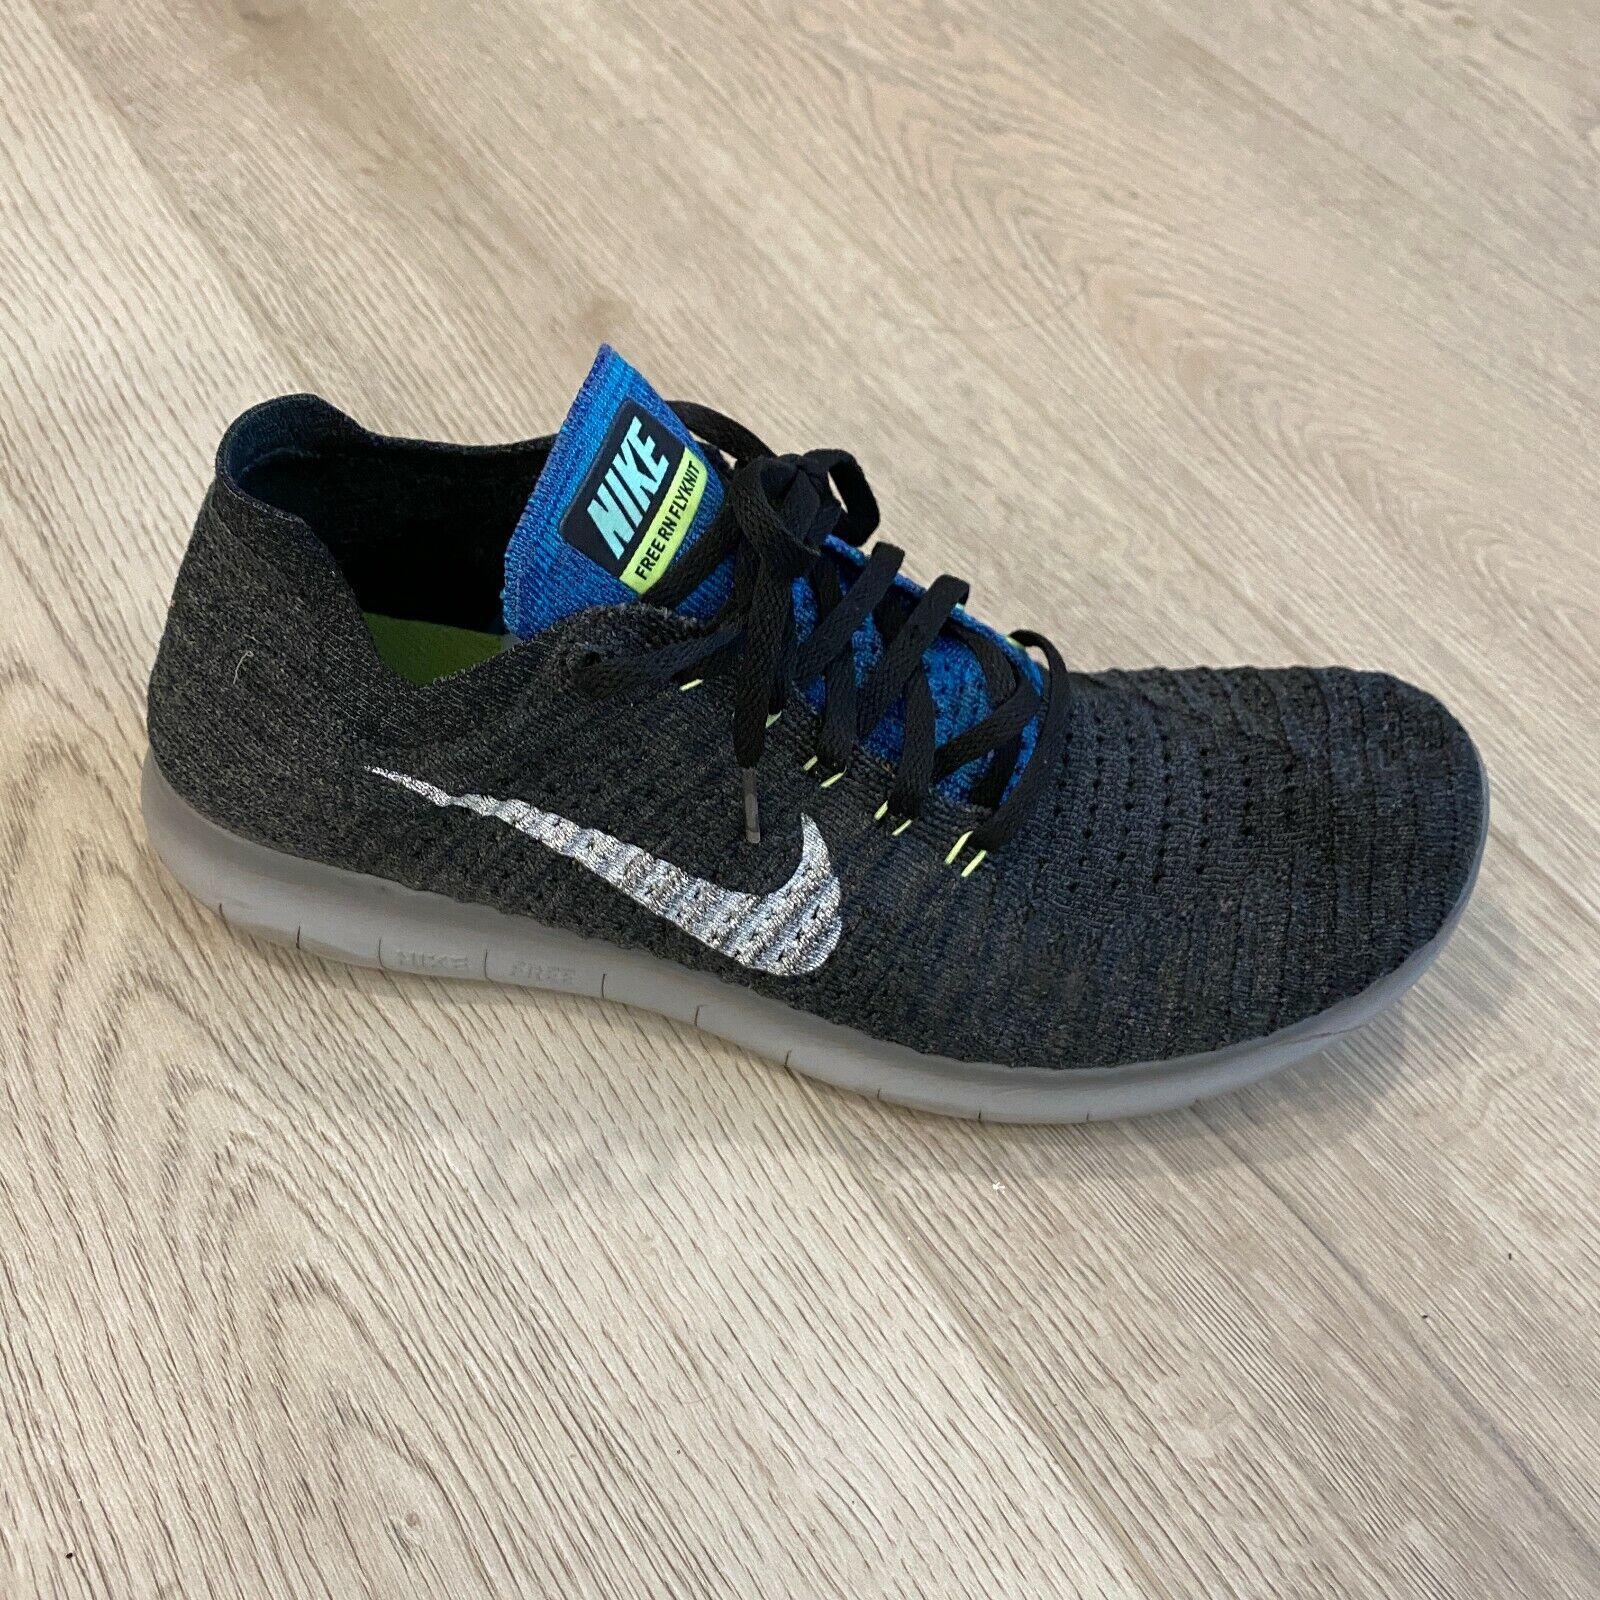 accoppiatore Positivo terra  Nike RN Flyknit 2017 Run Blue Orbit Pure Platinum Men Running 880843-403  10.5 for sale online   eBay